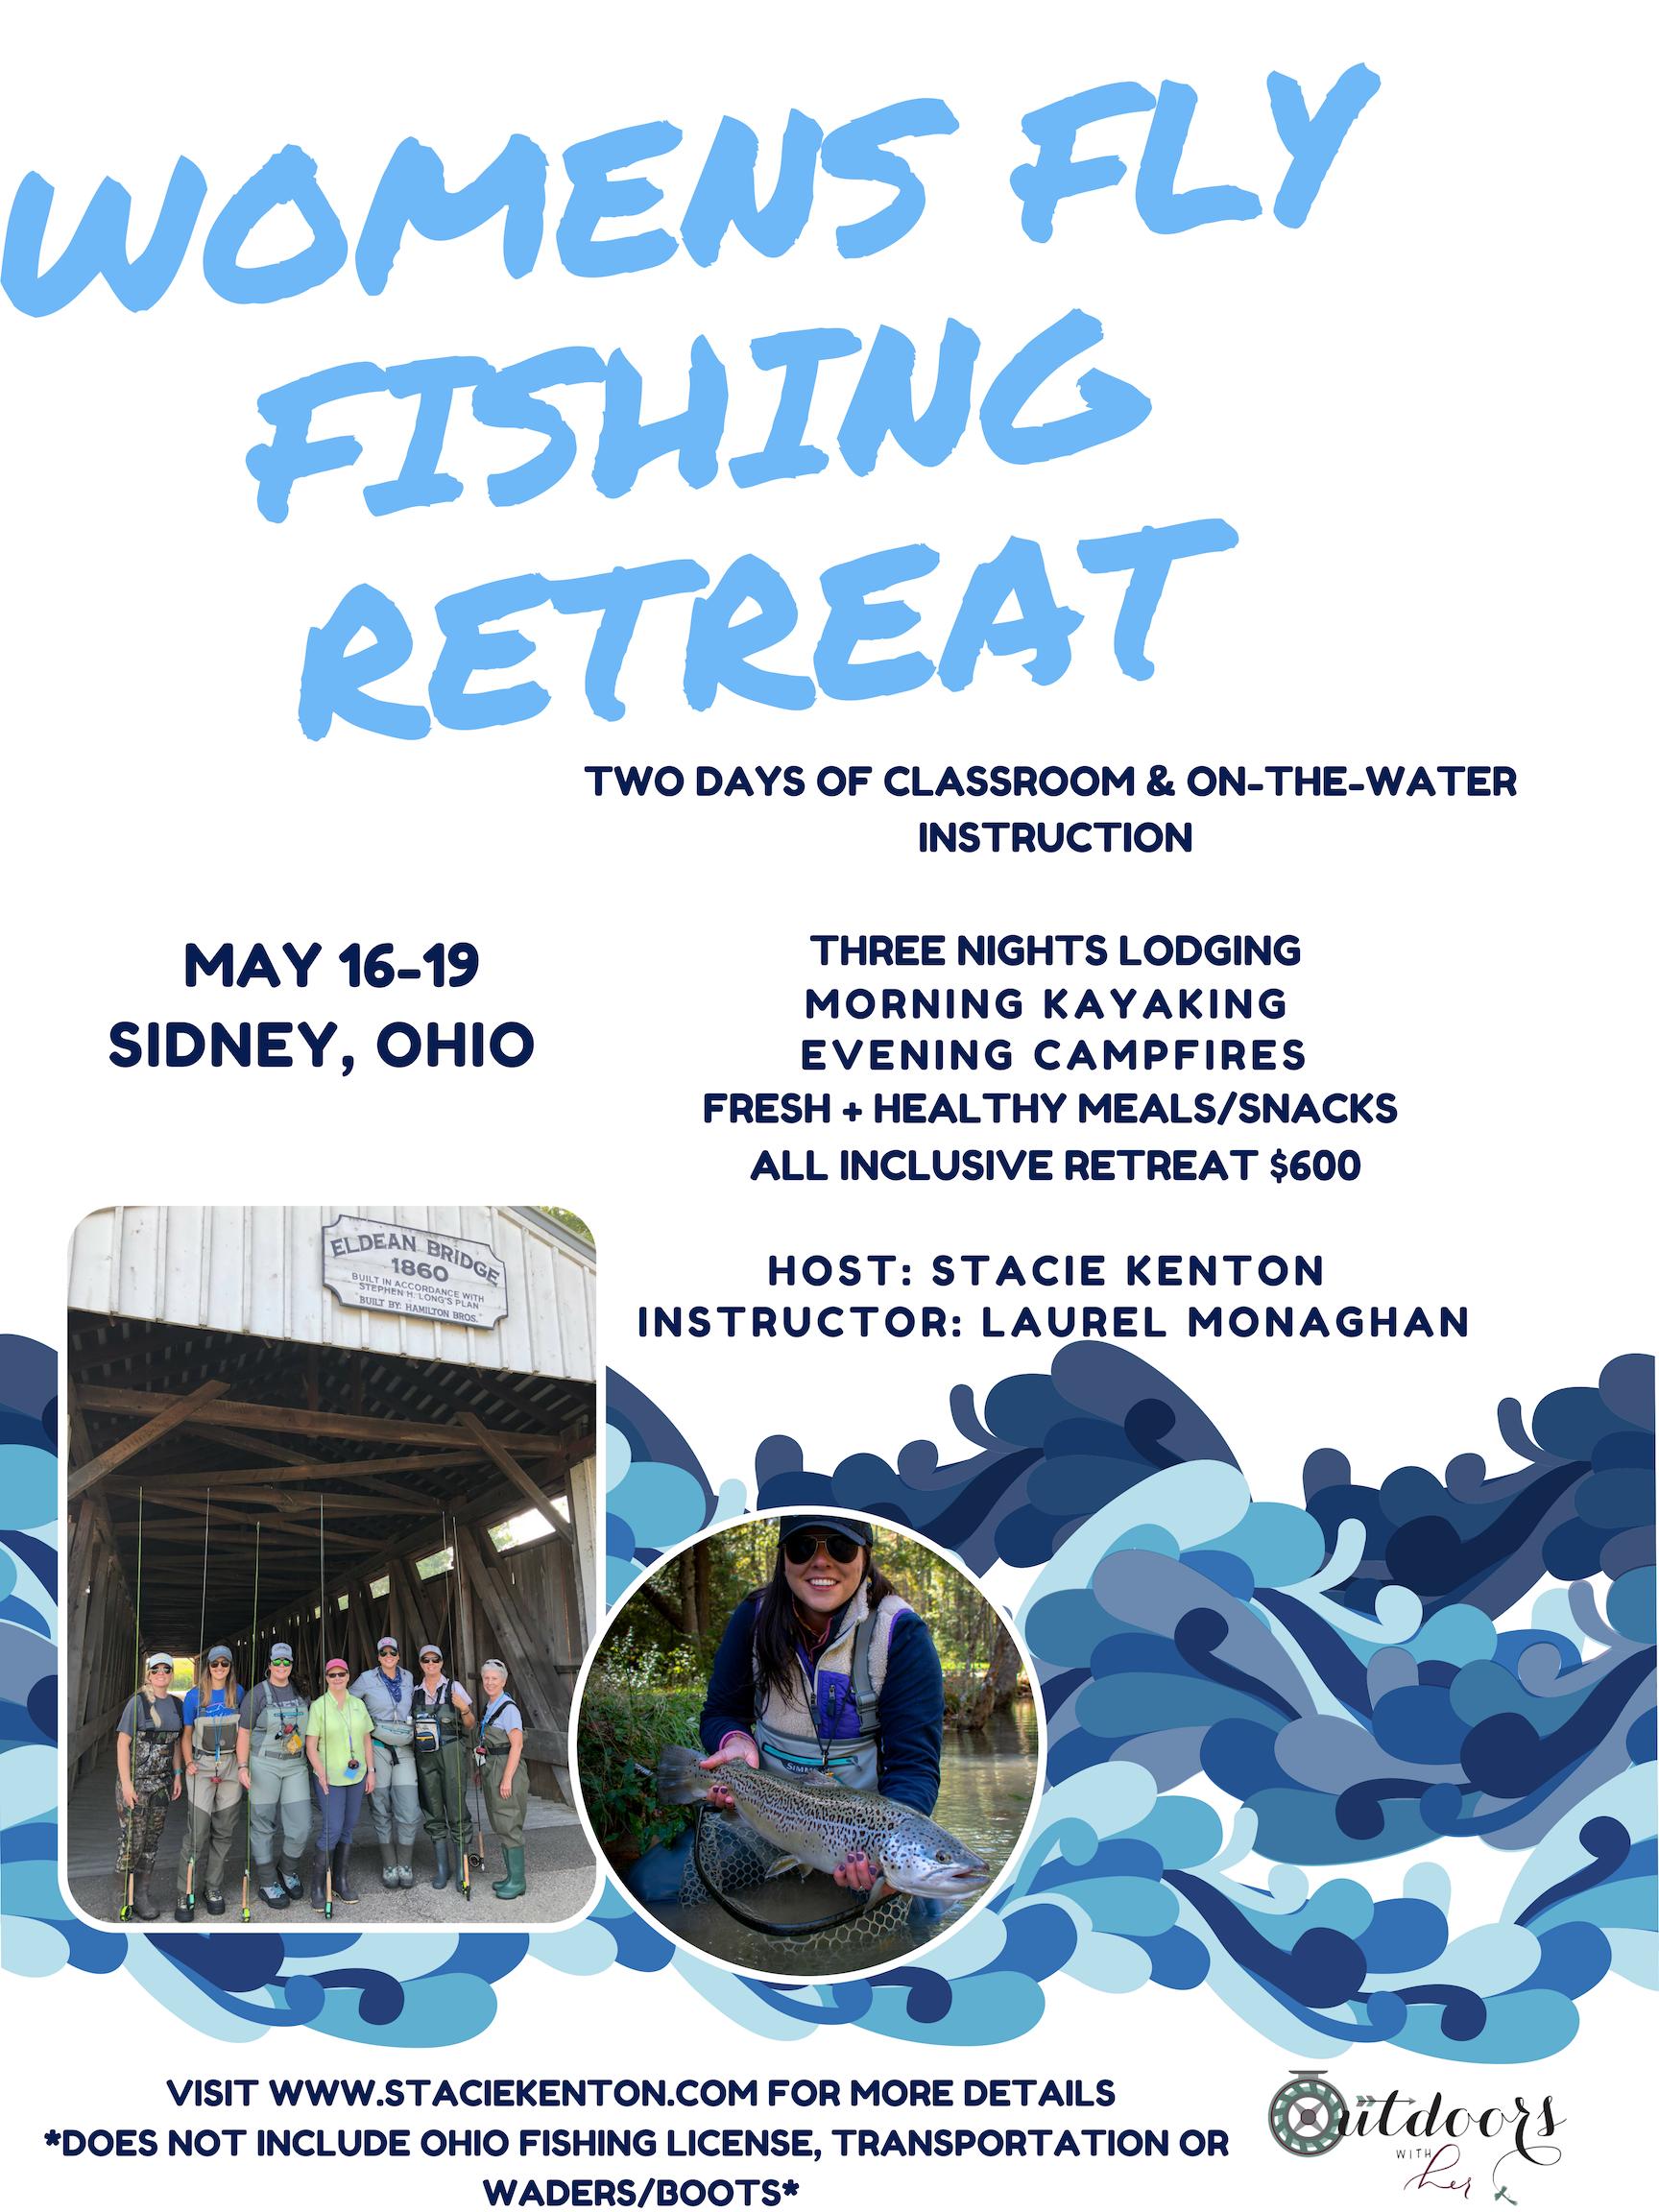 May 16-19 - Sidney, Ohio